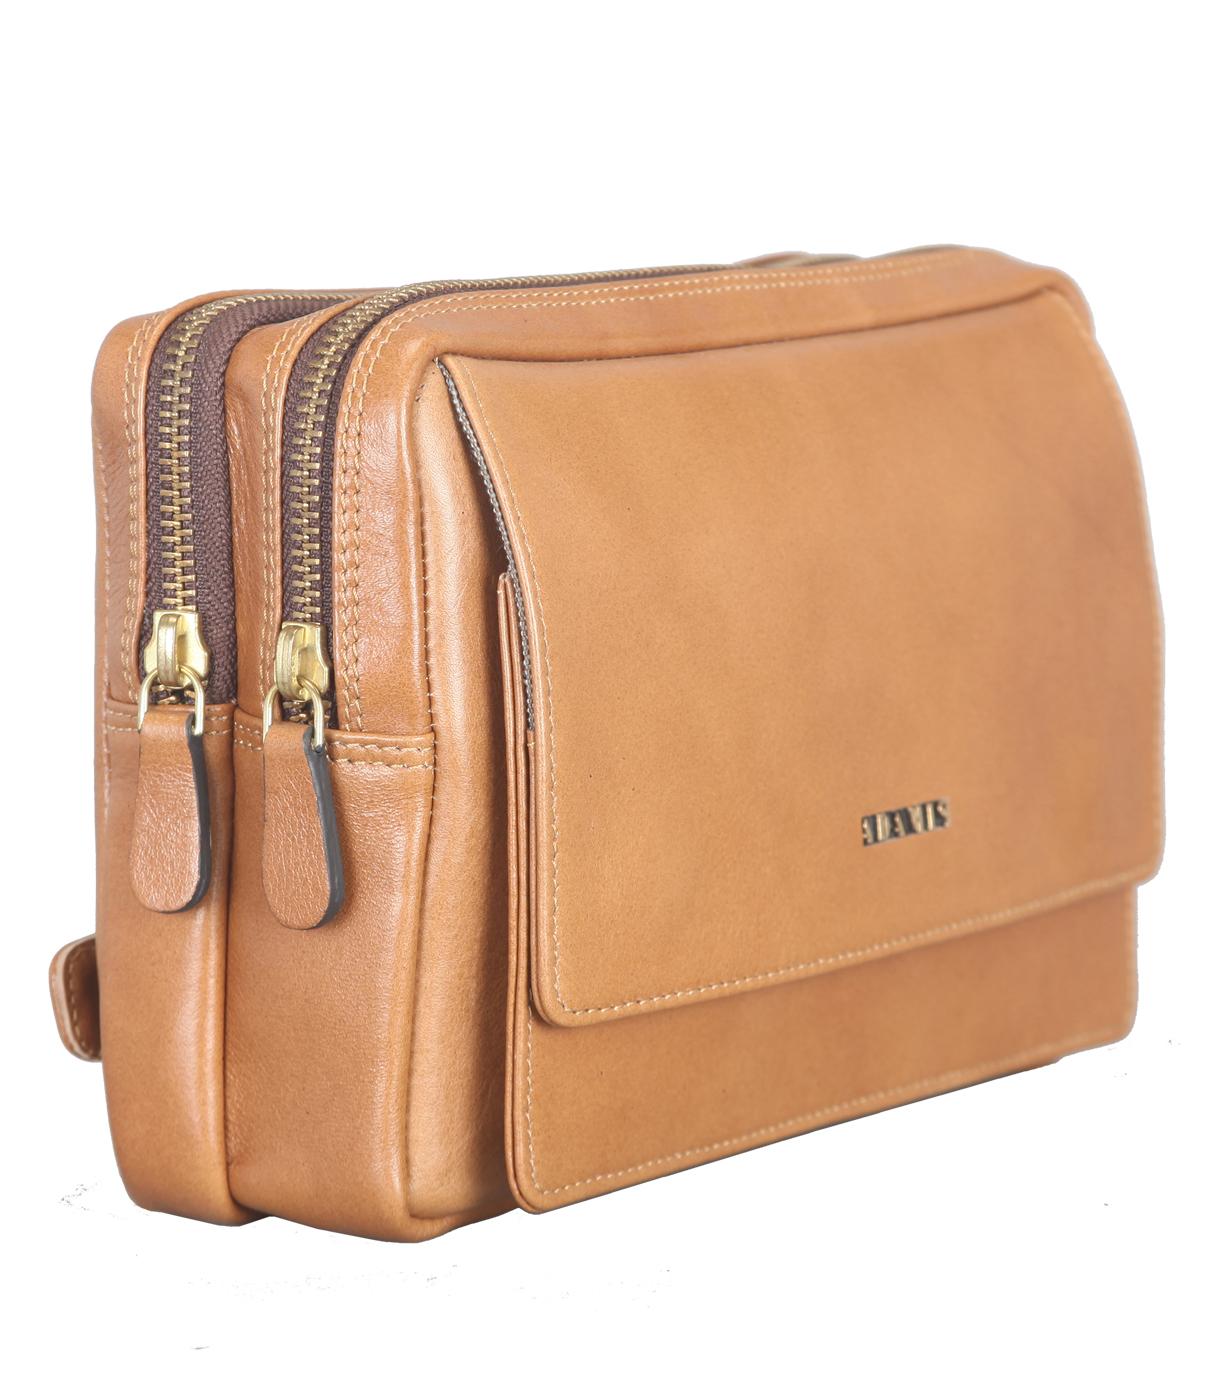 P32-Jesse-Men's bag cum travel pouch in Genuine Leather  - Tan